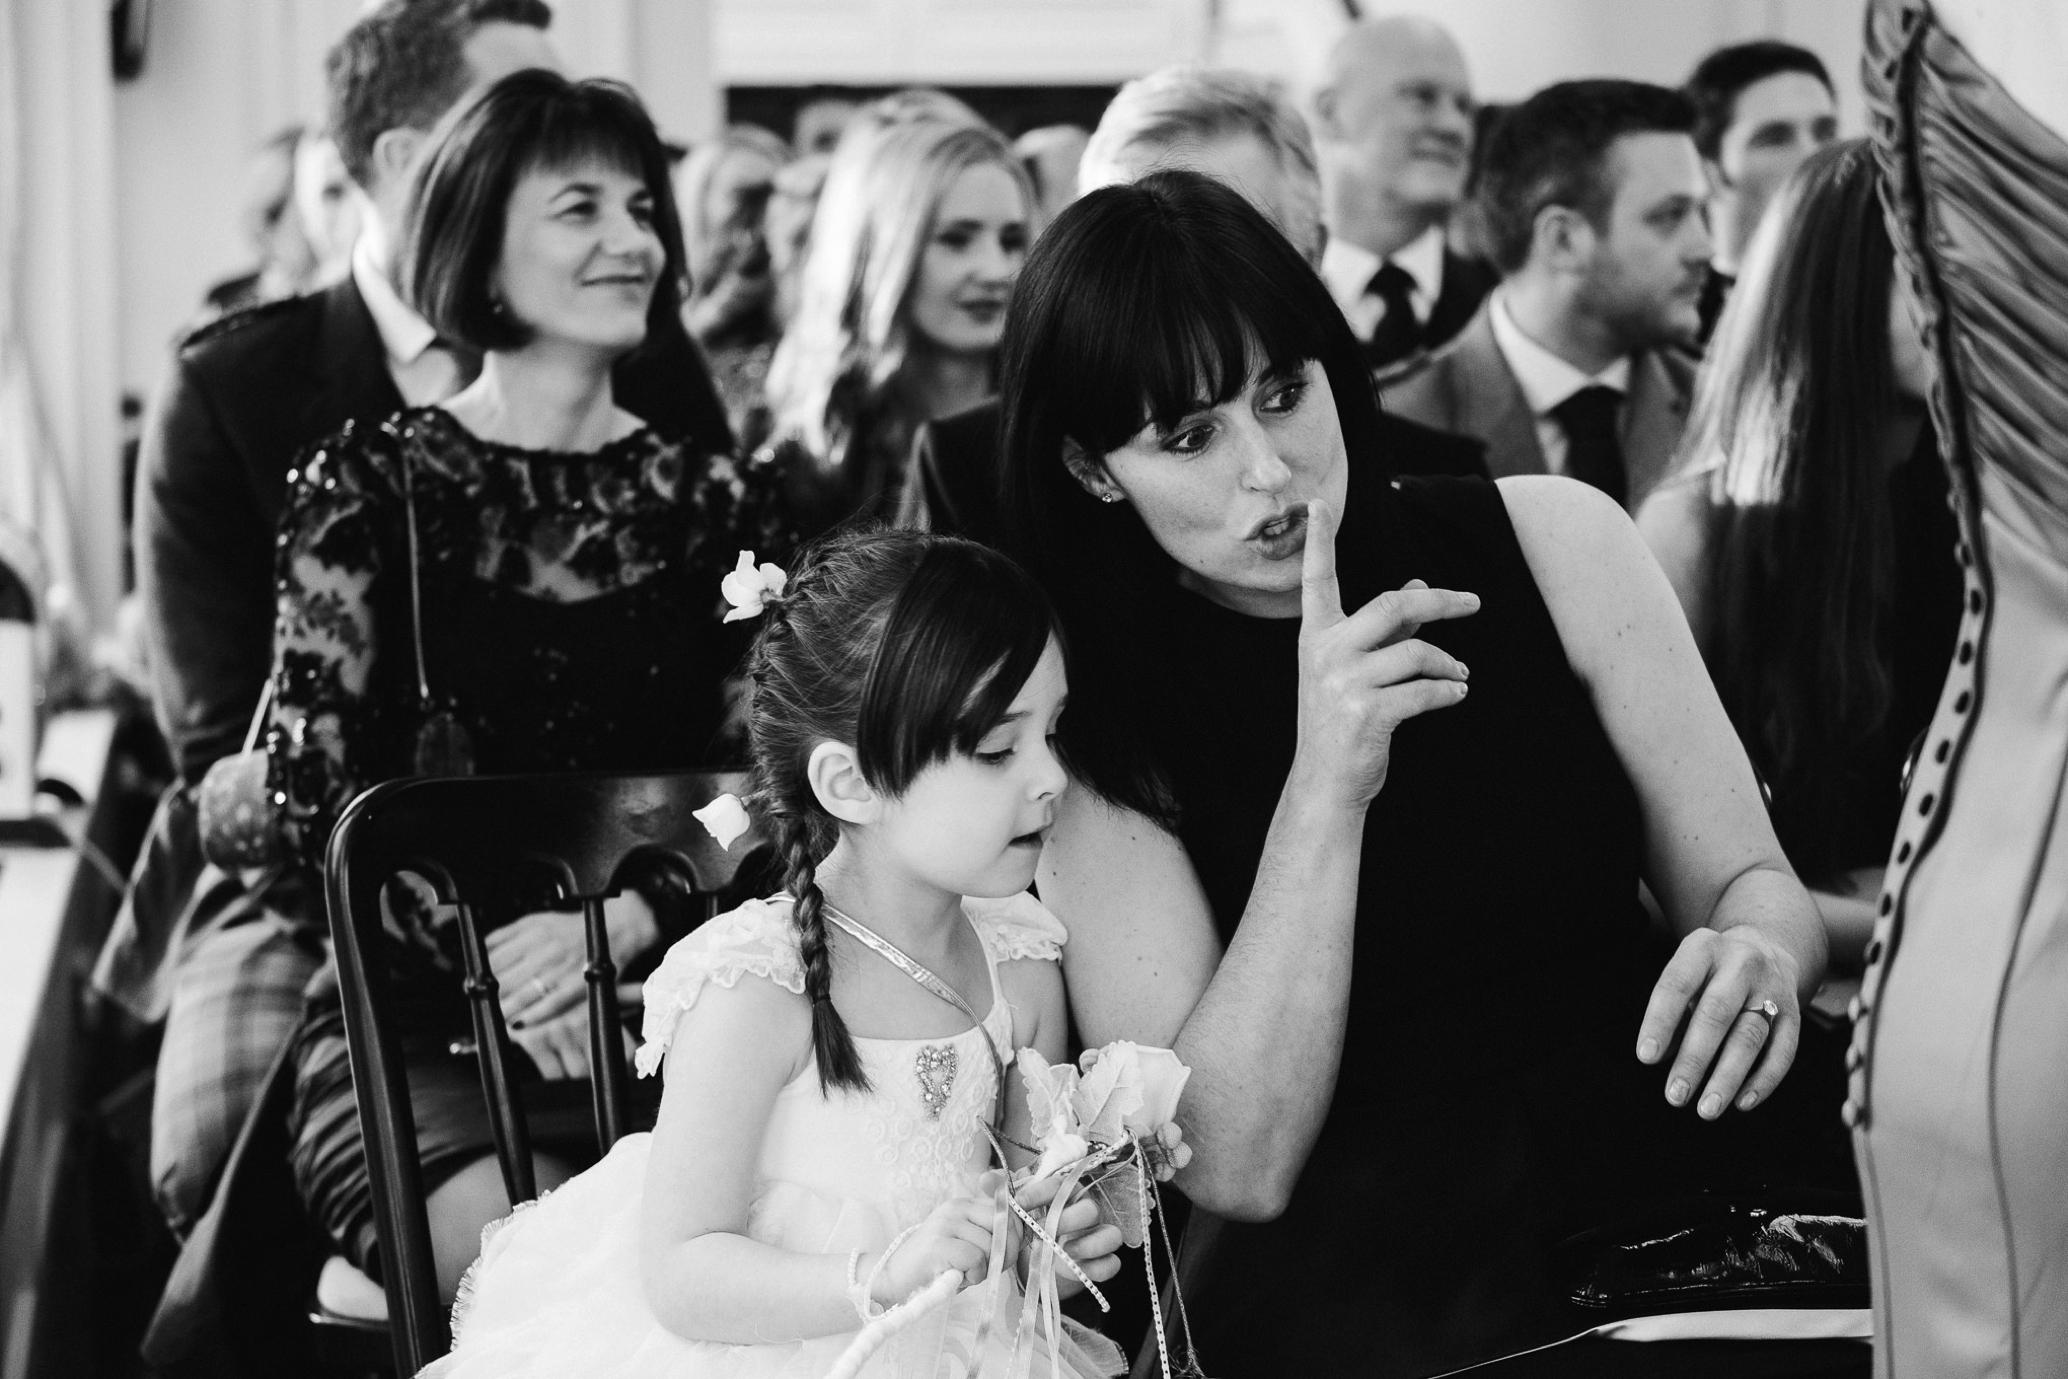 20171216_euan robertson weddings_036_WEB.jpg